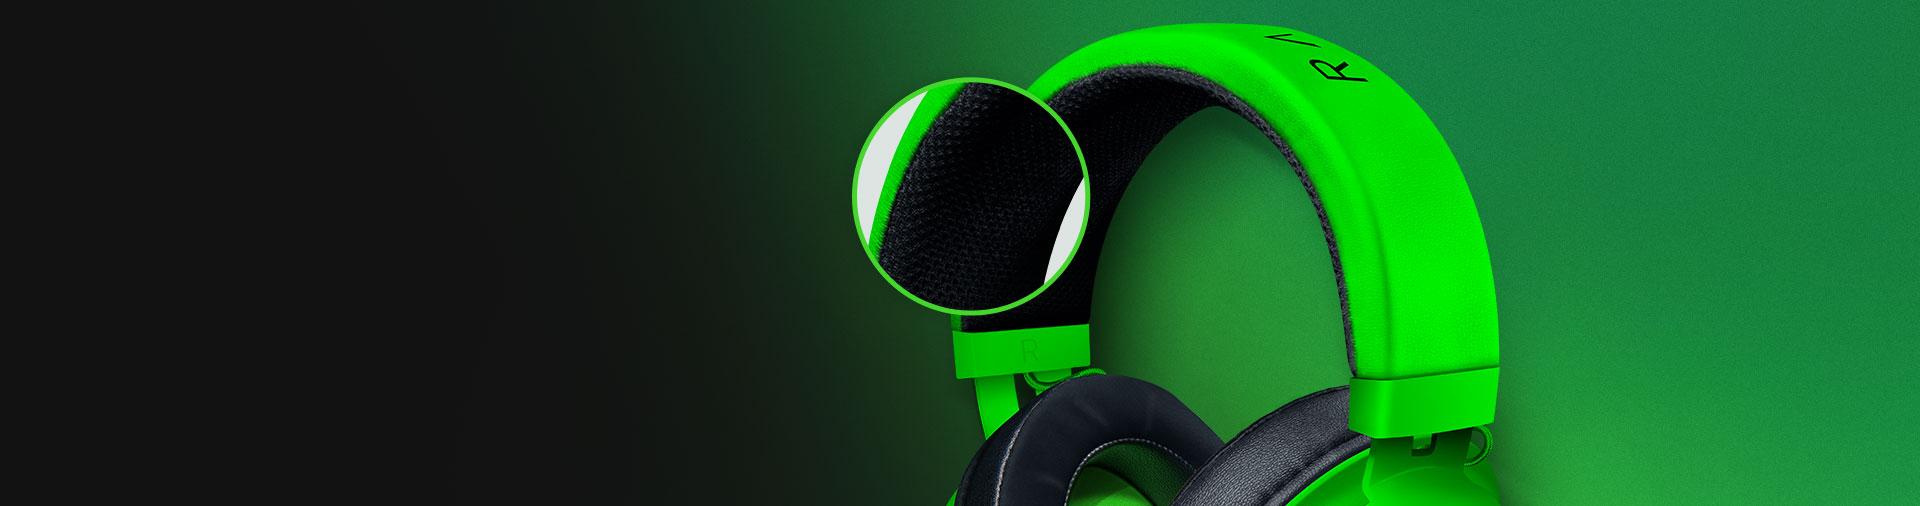 https://assets2.razerzone.com/images/pnx.assets/0622f43212fdb9b0153b345972889d2d/razer-kraken-2019-usp-headband-desktop[1].jpg